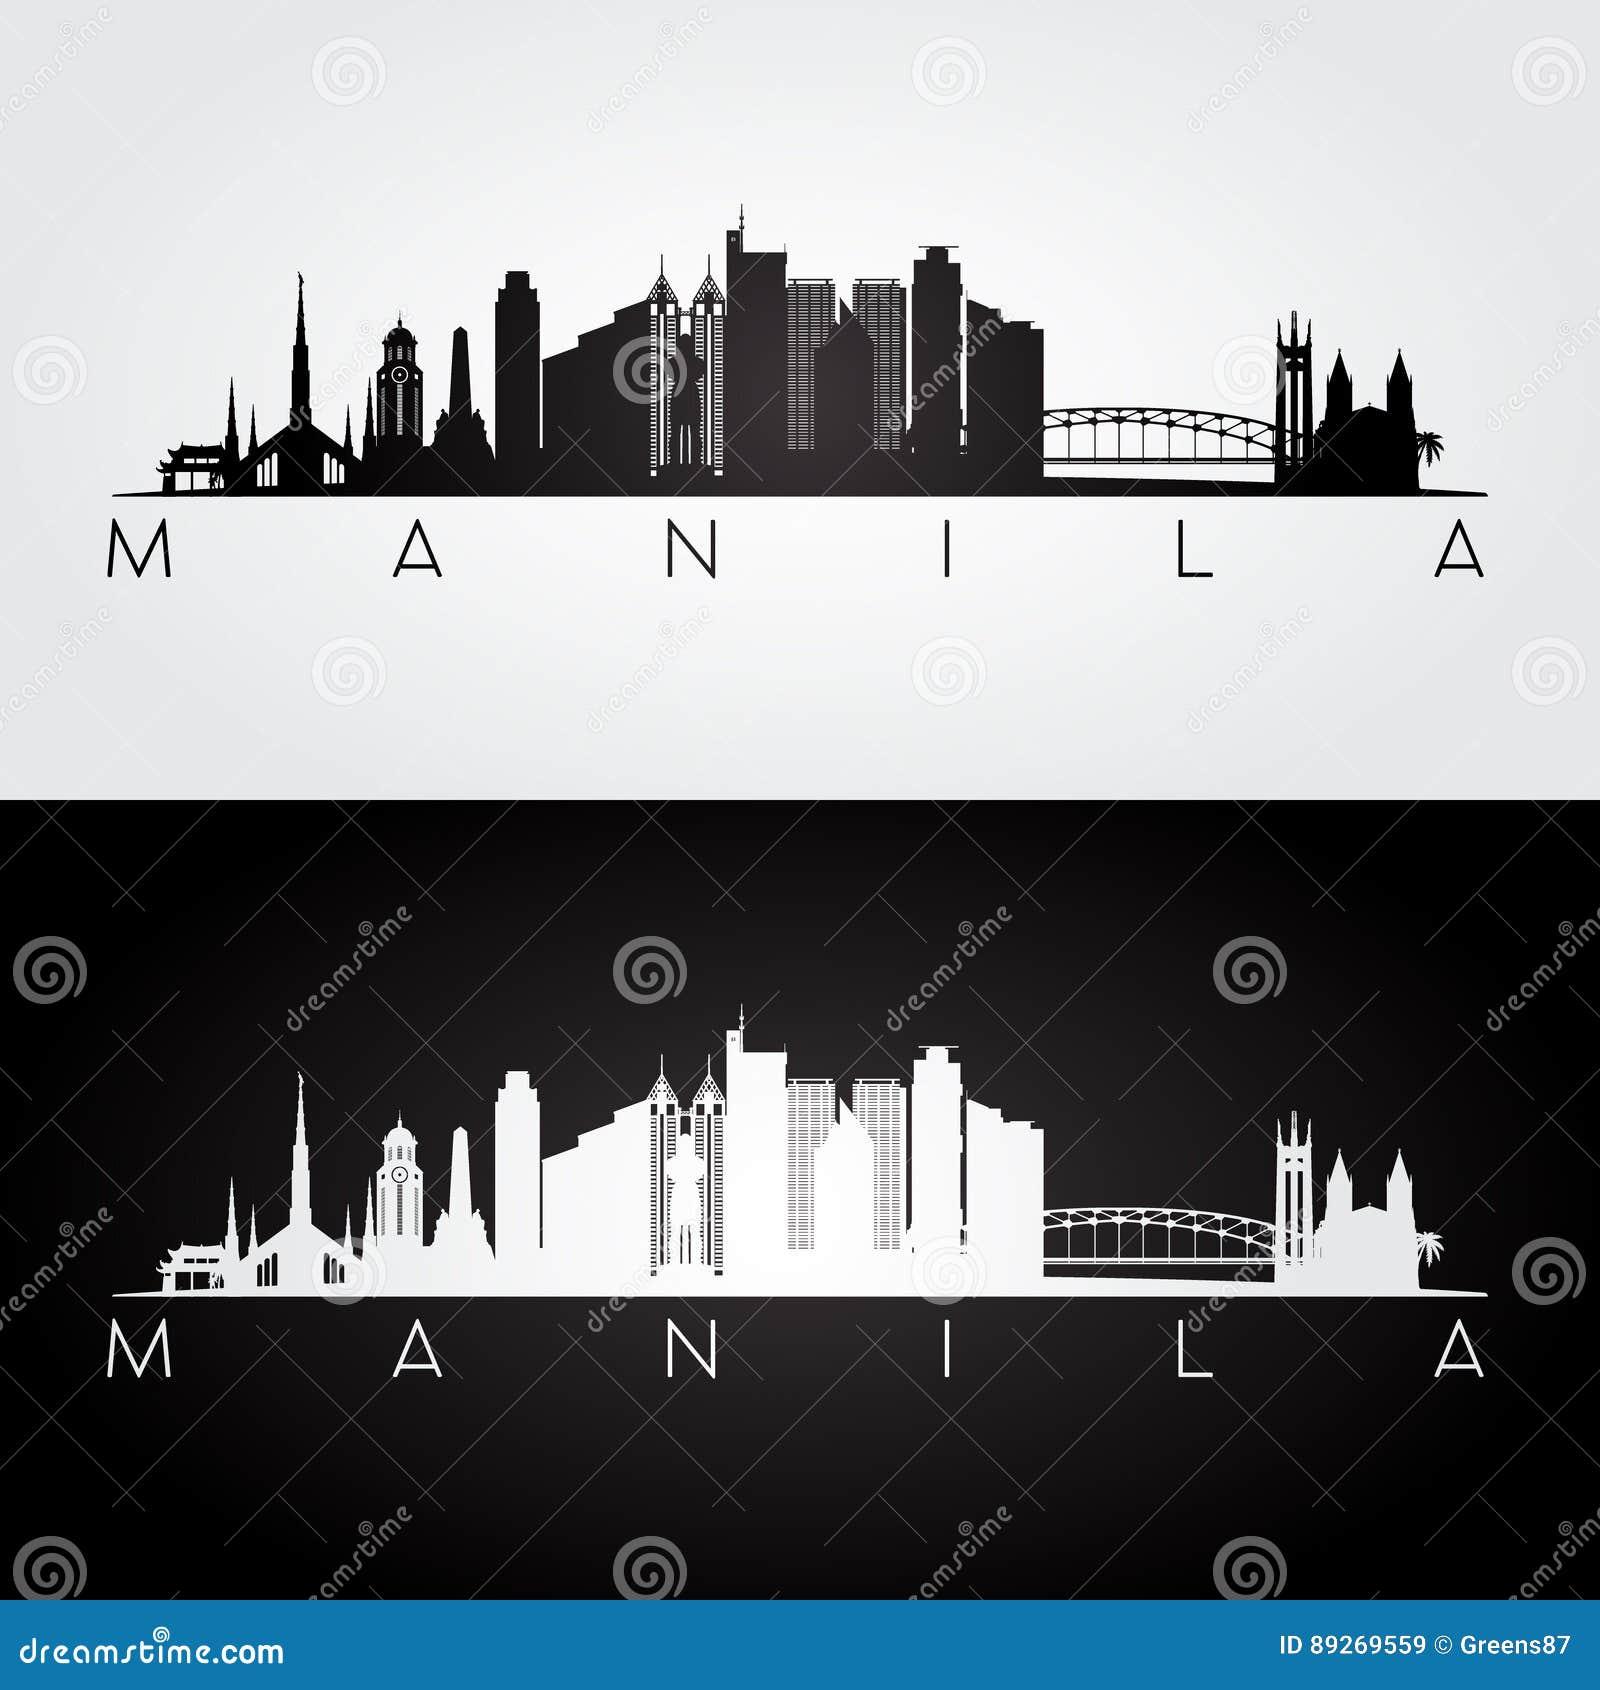 Manila Skyline And Landmarks Silhouette. Stock Vector